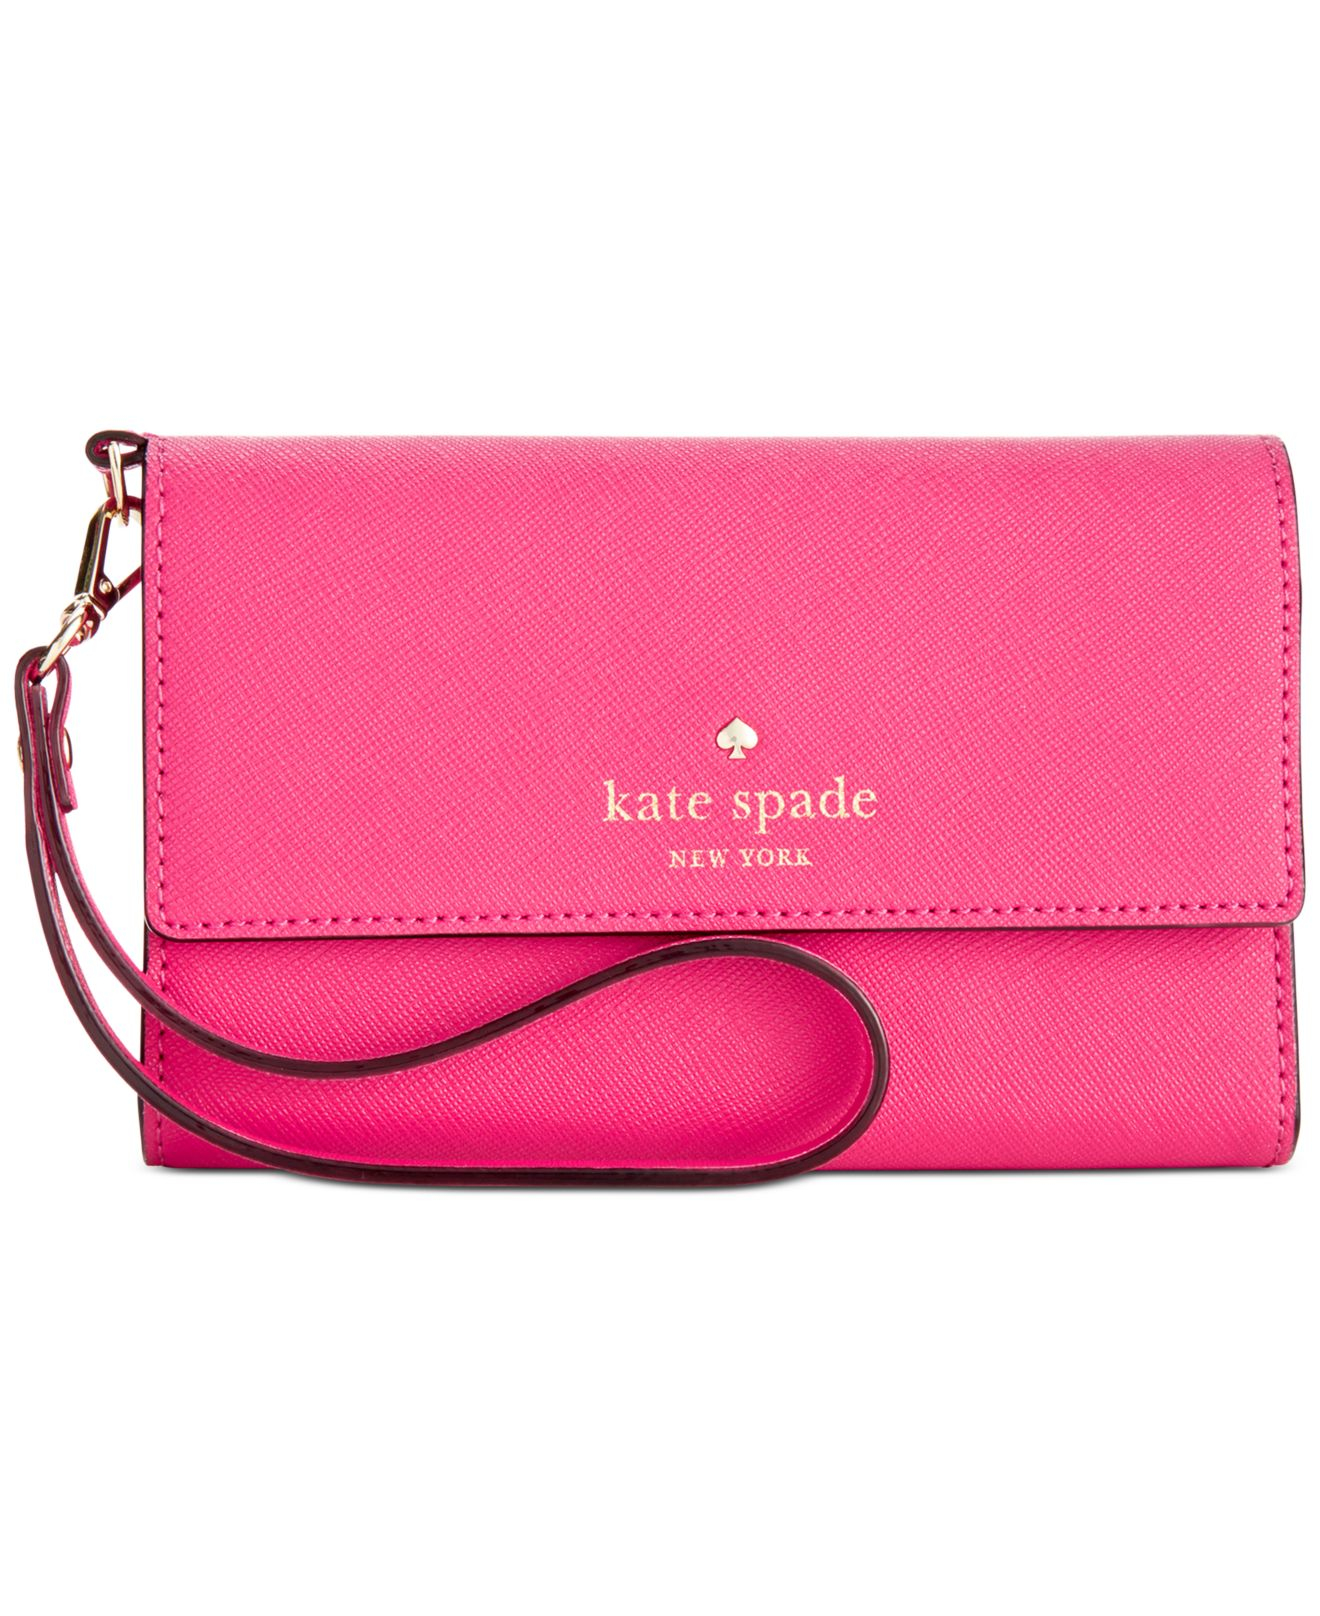 Iphone  Plus Wristlet Kate Spade